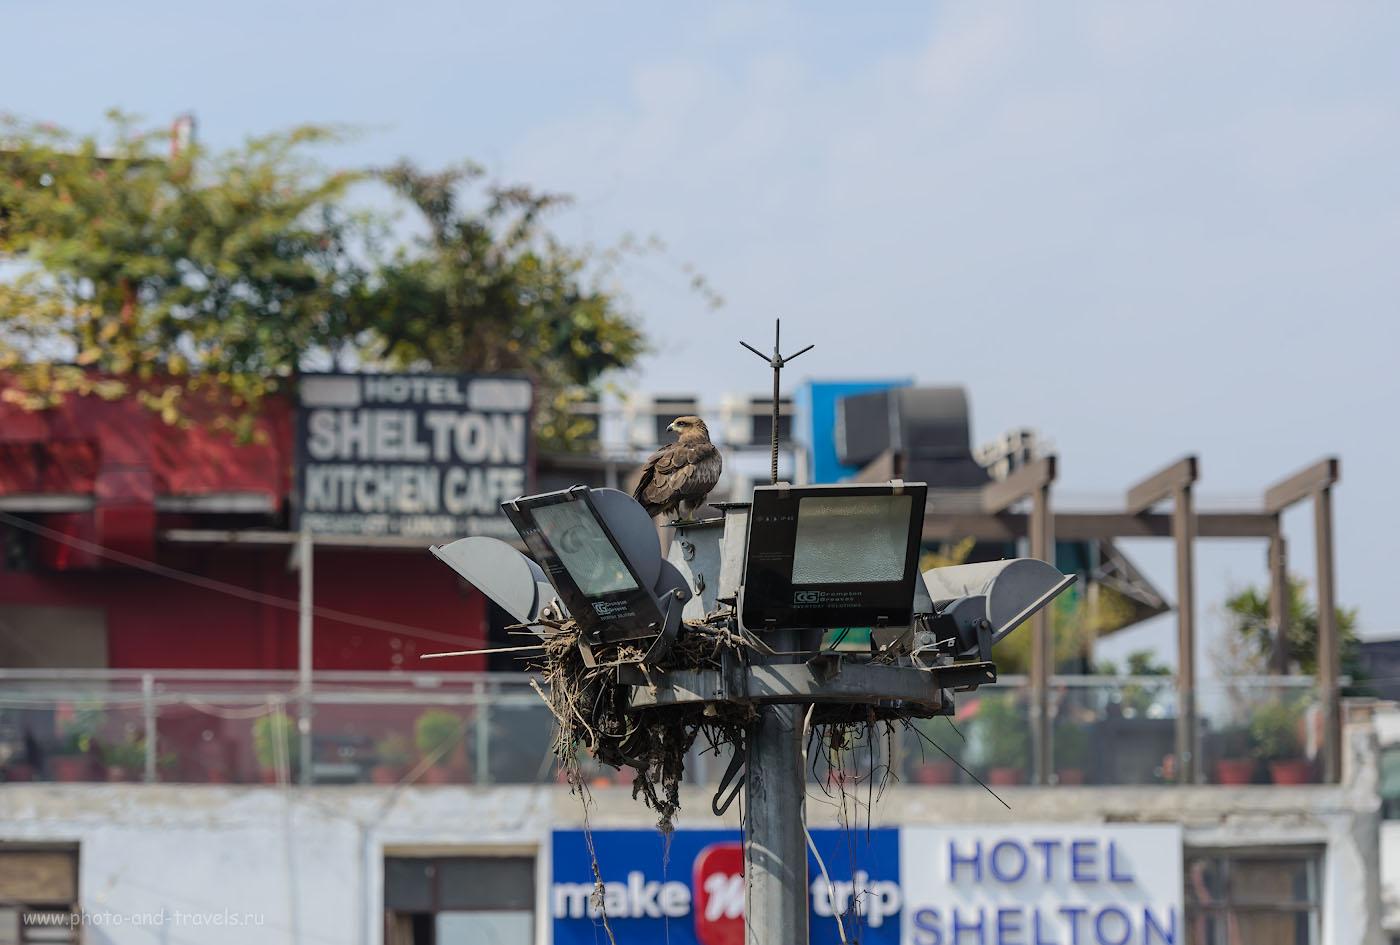 Фото 3. Ястреб на Мейн-Базаре. Отчеты об отдыхе в Индии самостоятельно. Полный кадр Nikon D610 + телеобъектив Nikon 70-200mm f/2.8G. Параметры съемки: 1/1250, 2.8, 100, 125.